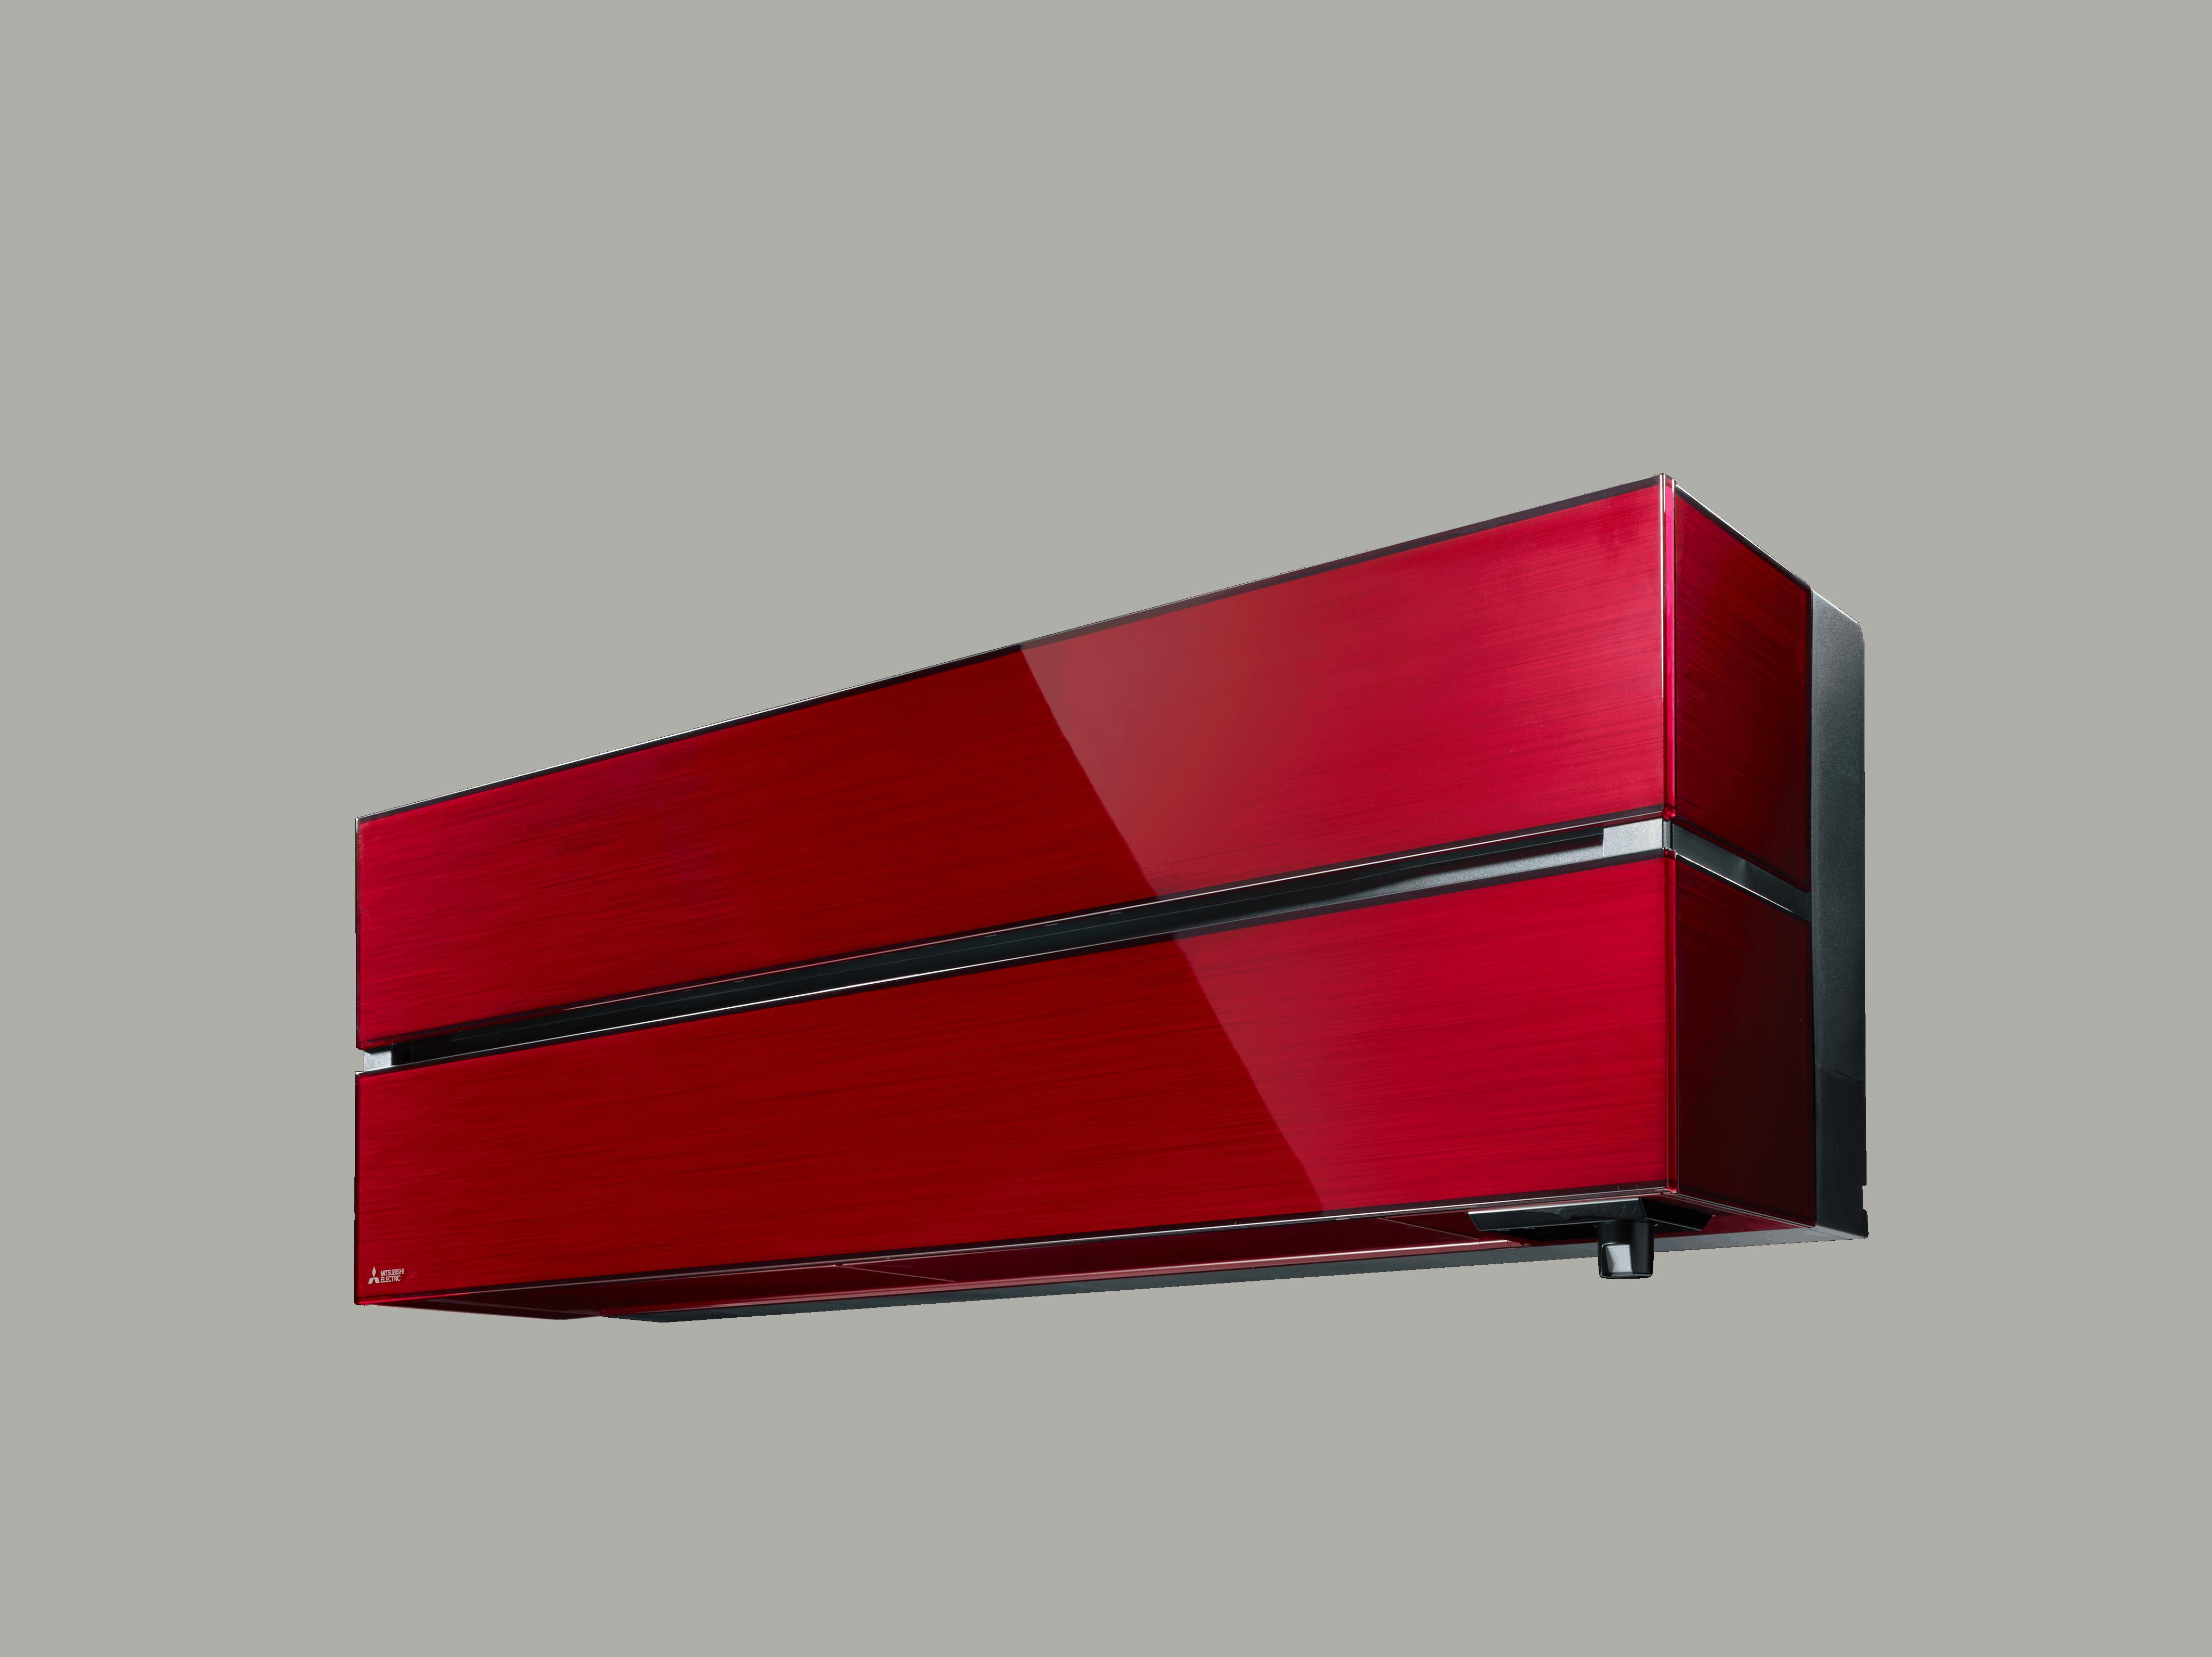 Mitsubishi_Electric_LN_punainen_sivusta